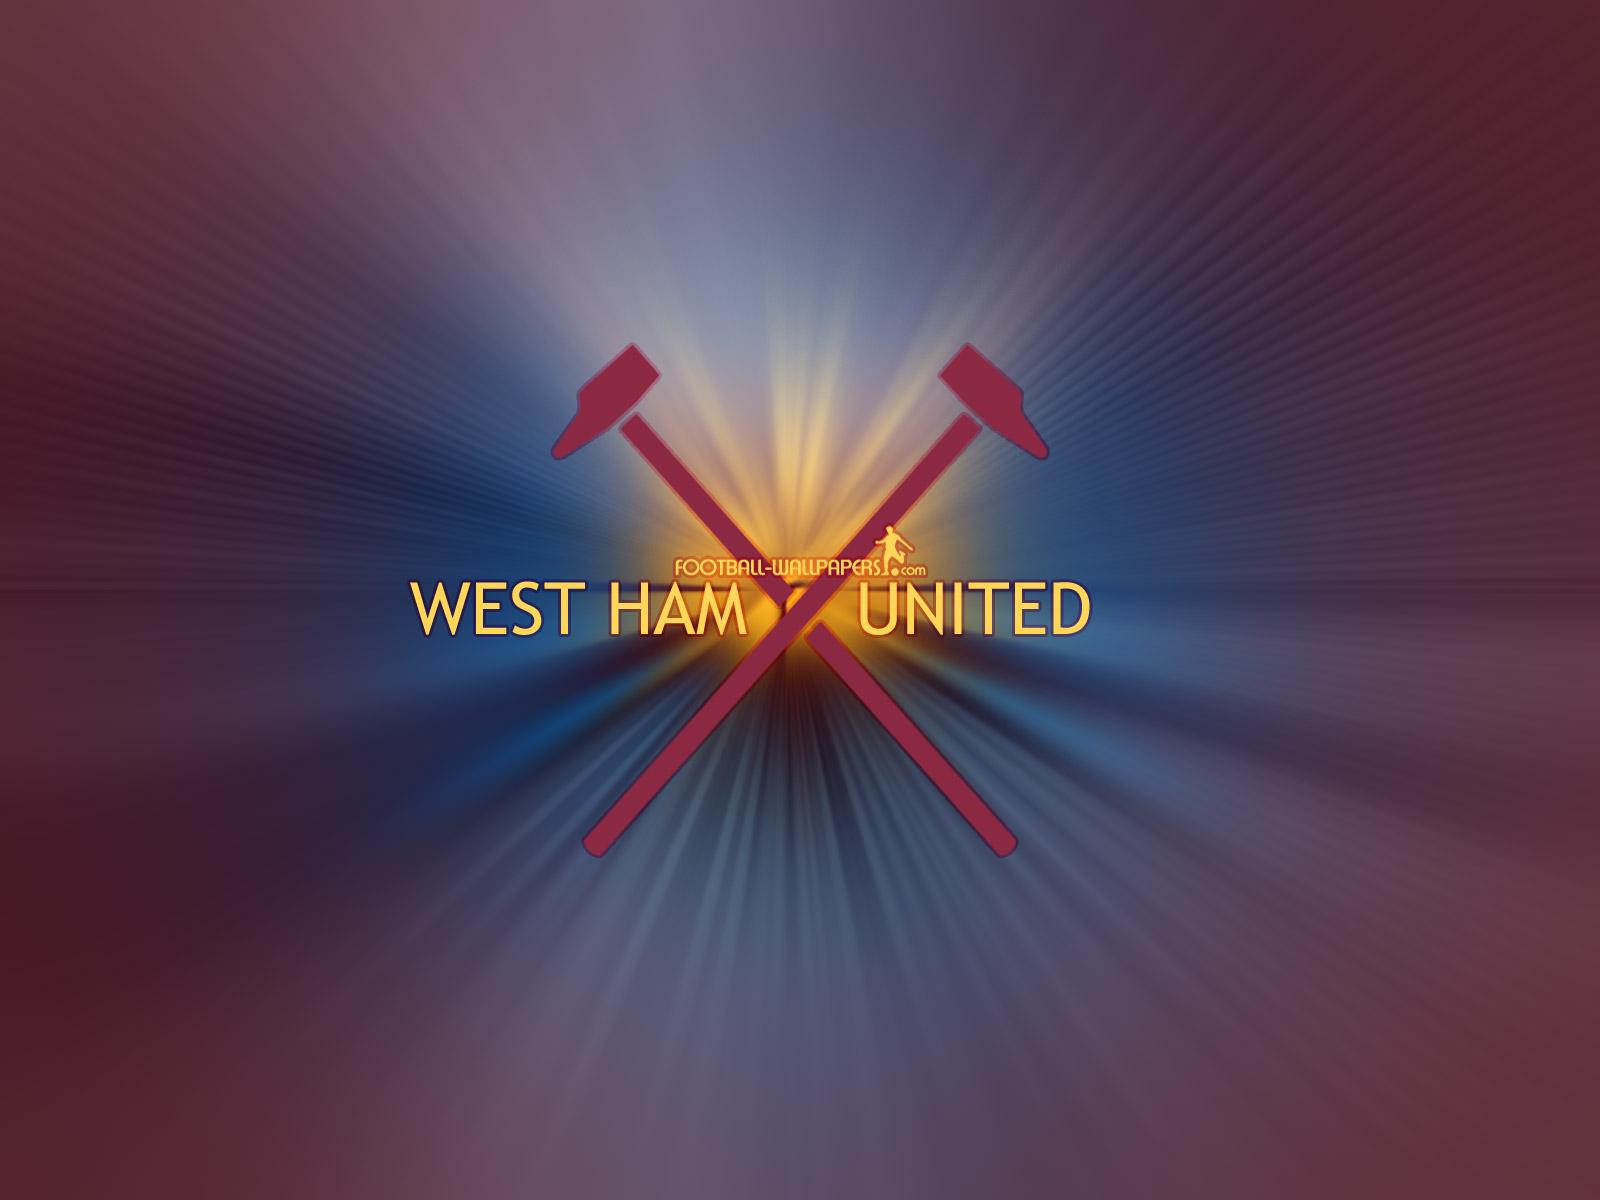 West Ham United Football Wallpaper 1600x1200